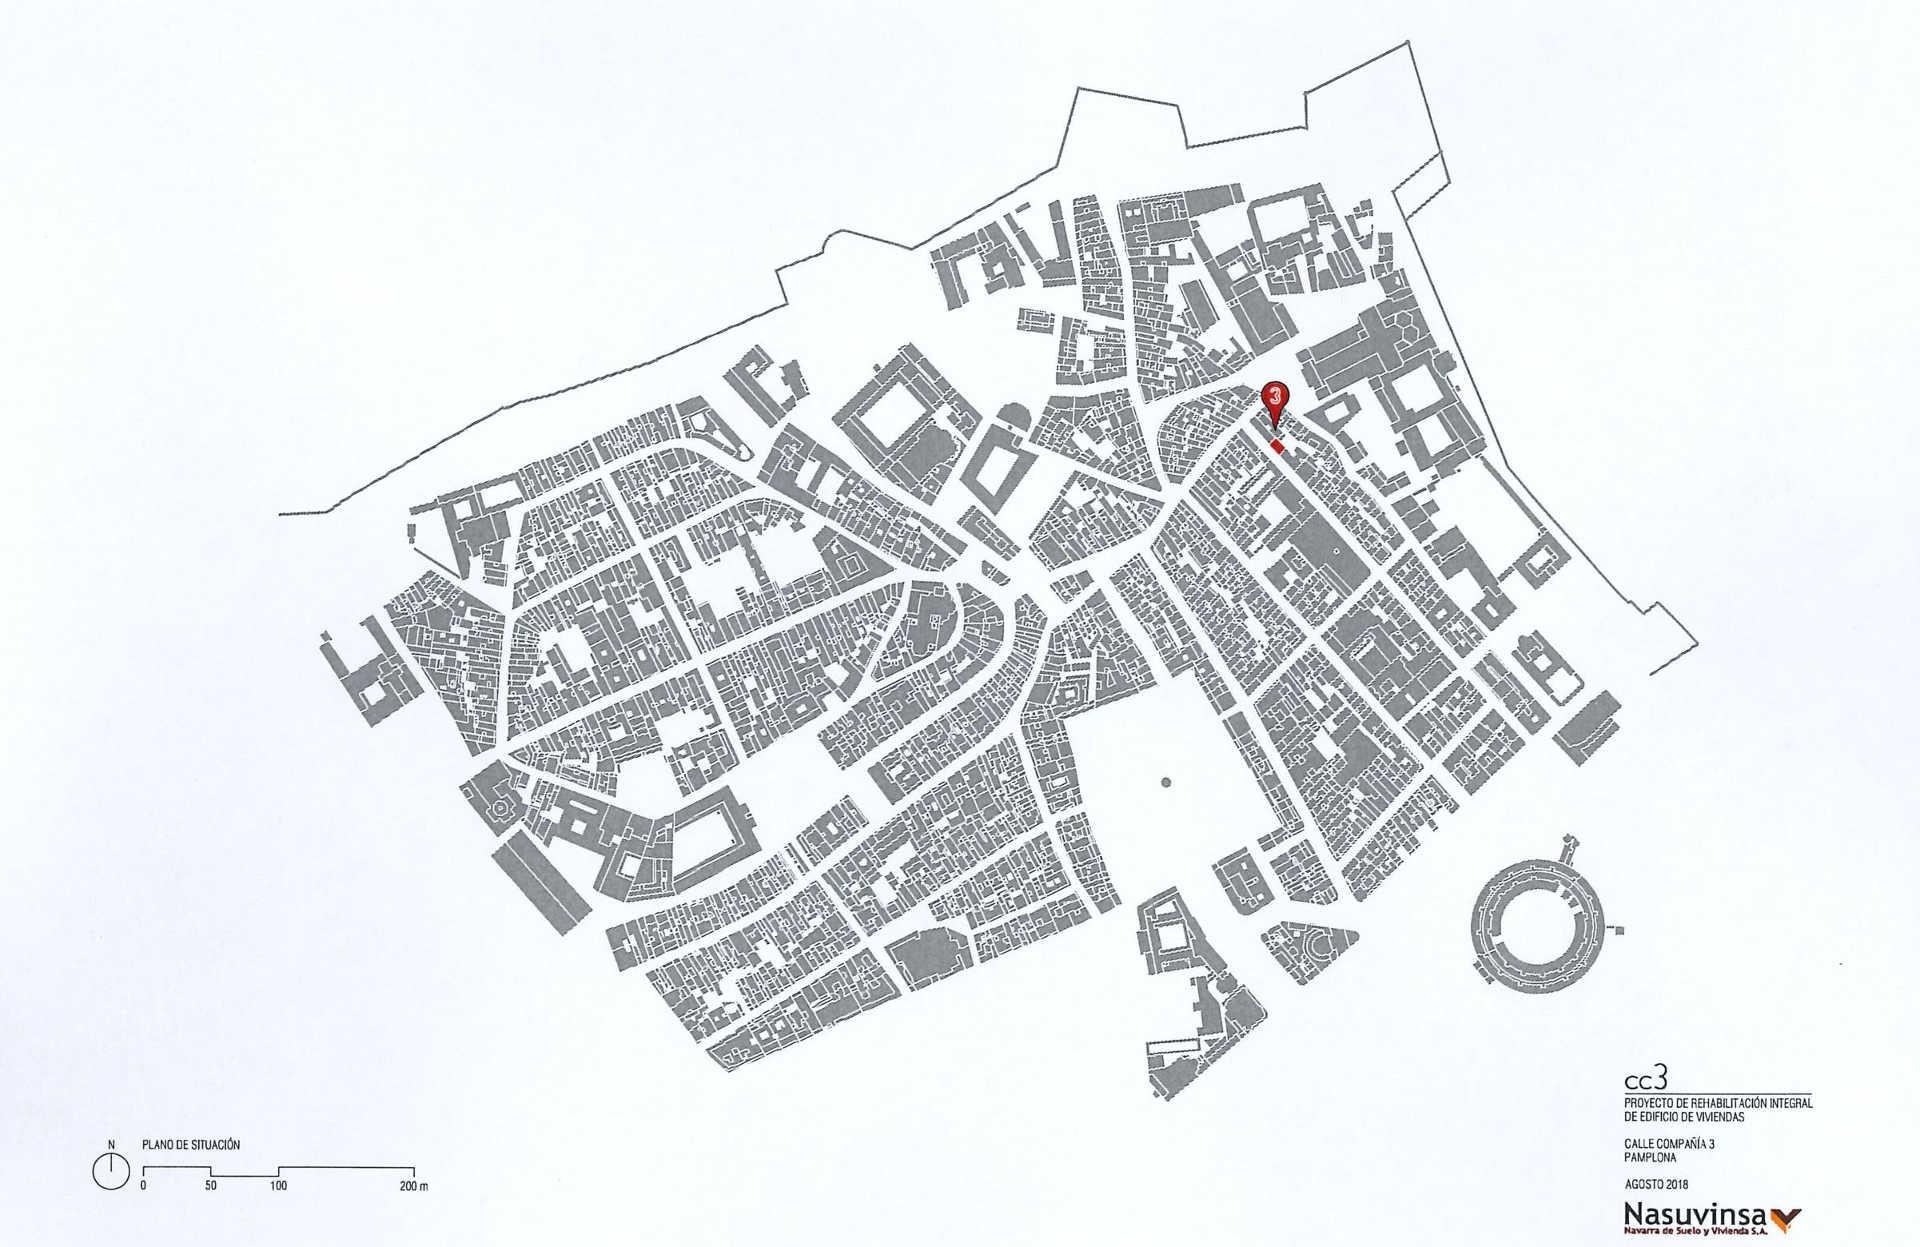 Calle Compañia